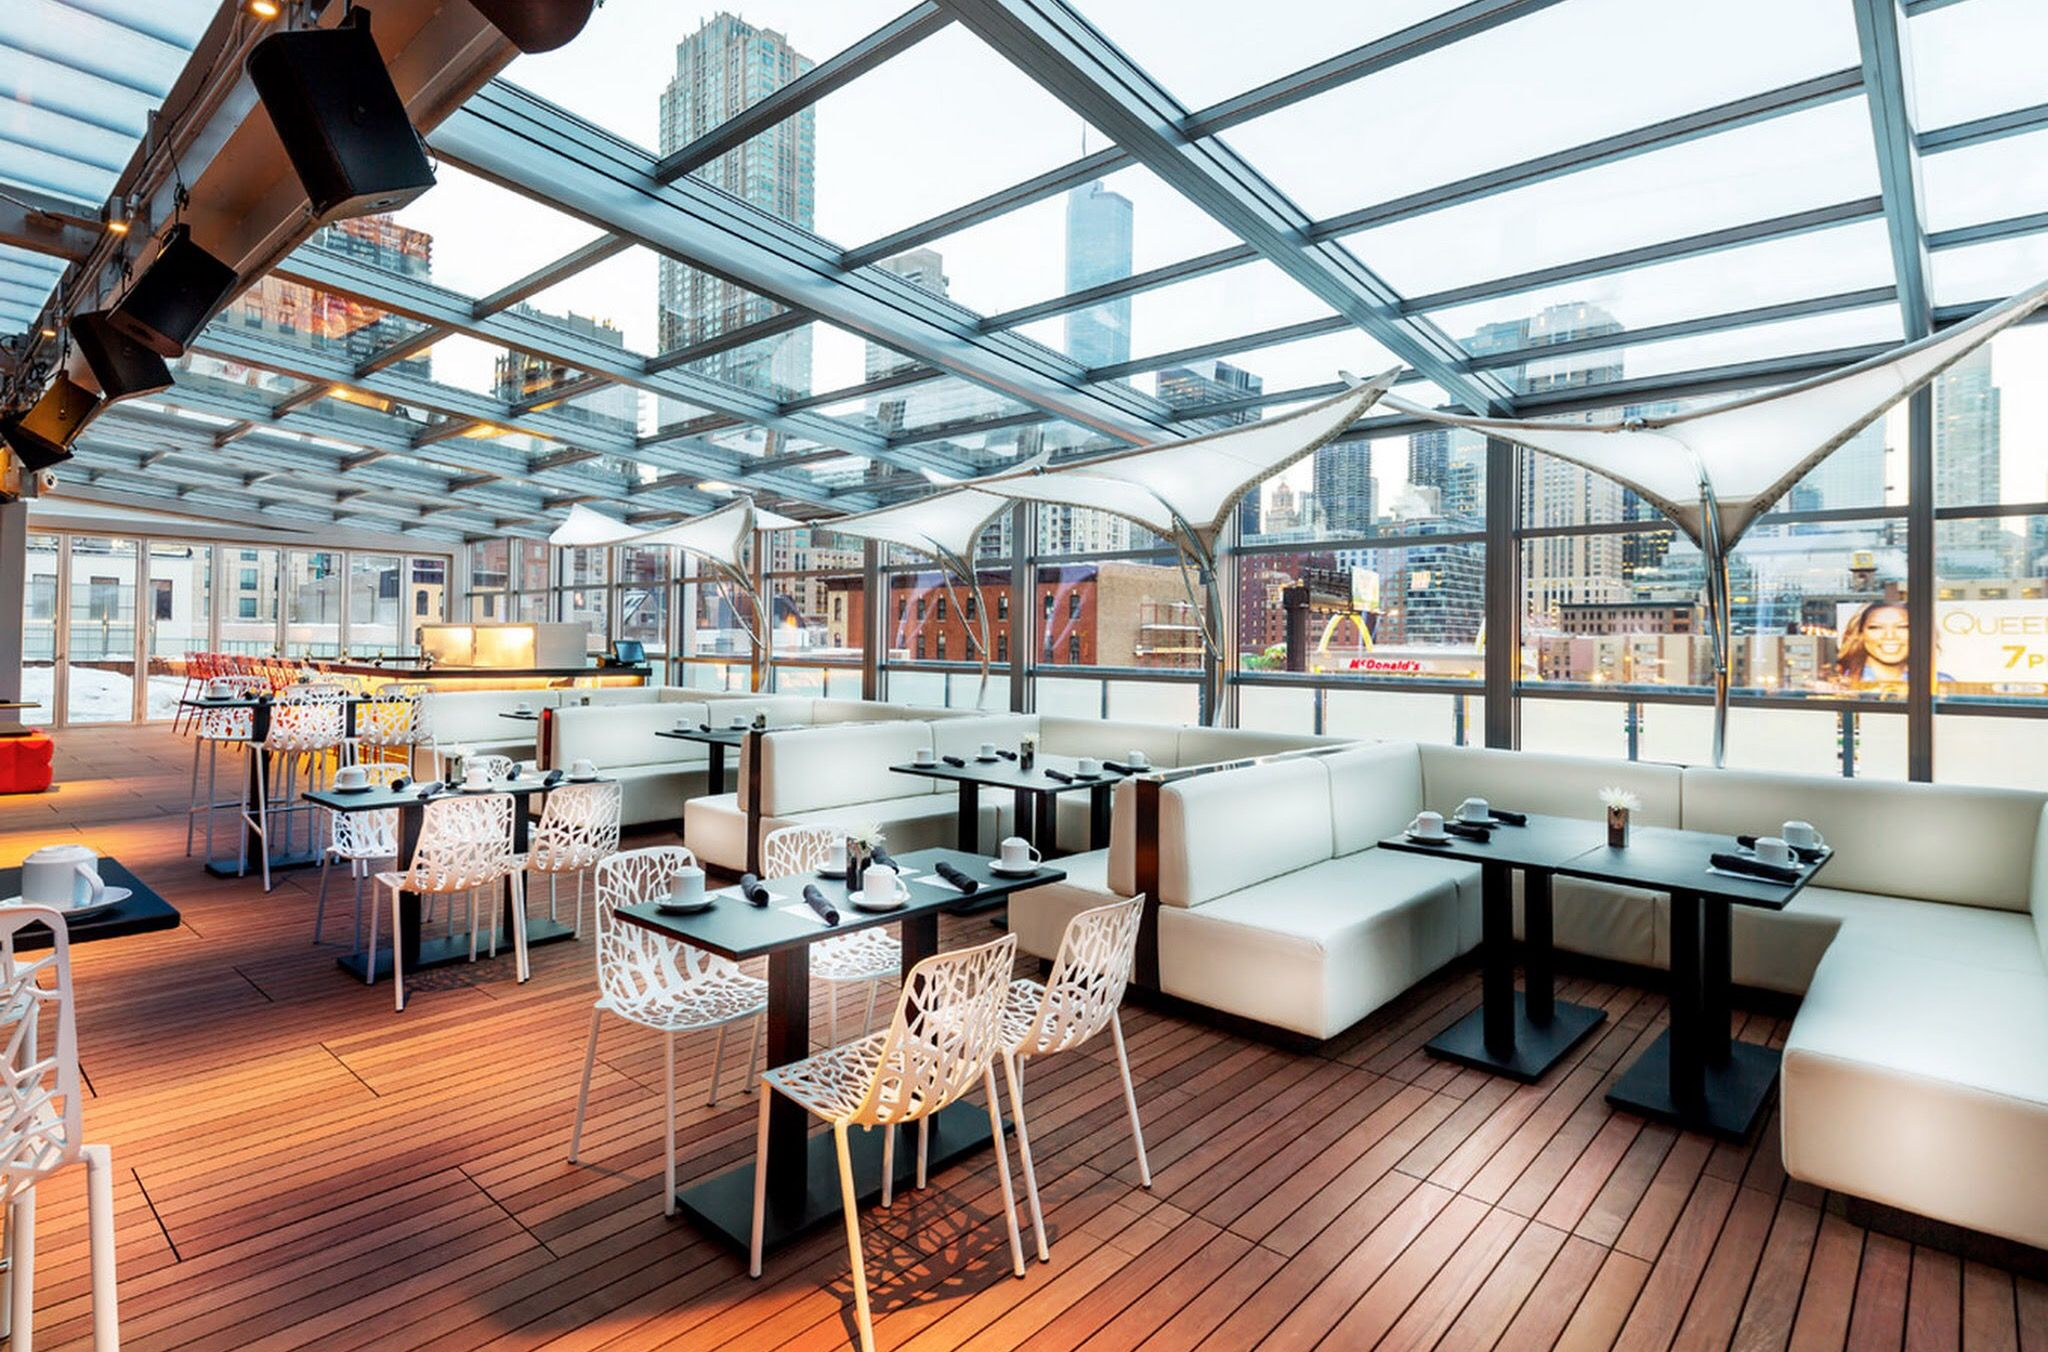 Godfrey Hotel : Chicago | Rooftop lounge, Rooftop bars ...